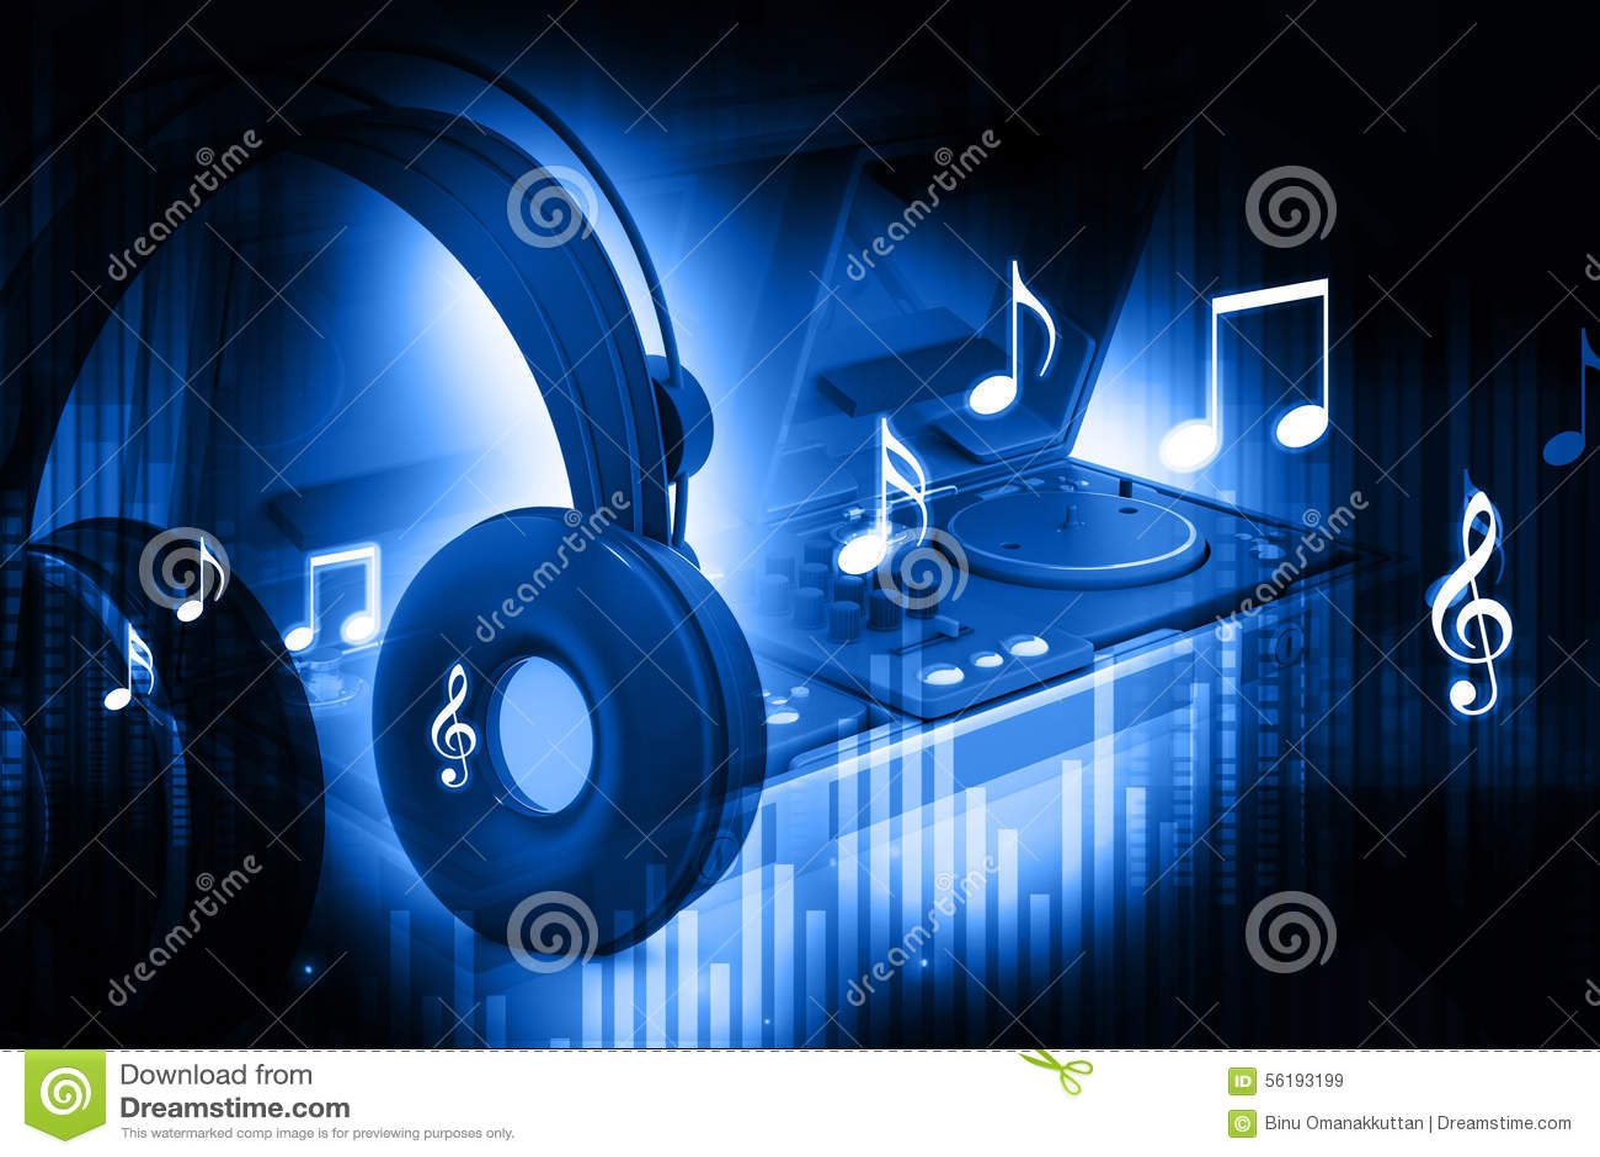 dj mixer with headphones stock illustration illustration of laptop 56193199. Black Bedroom Furniture Sets. Home Design Ideas